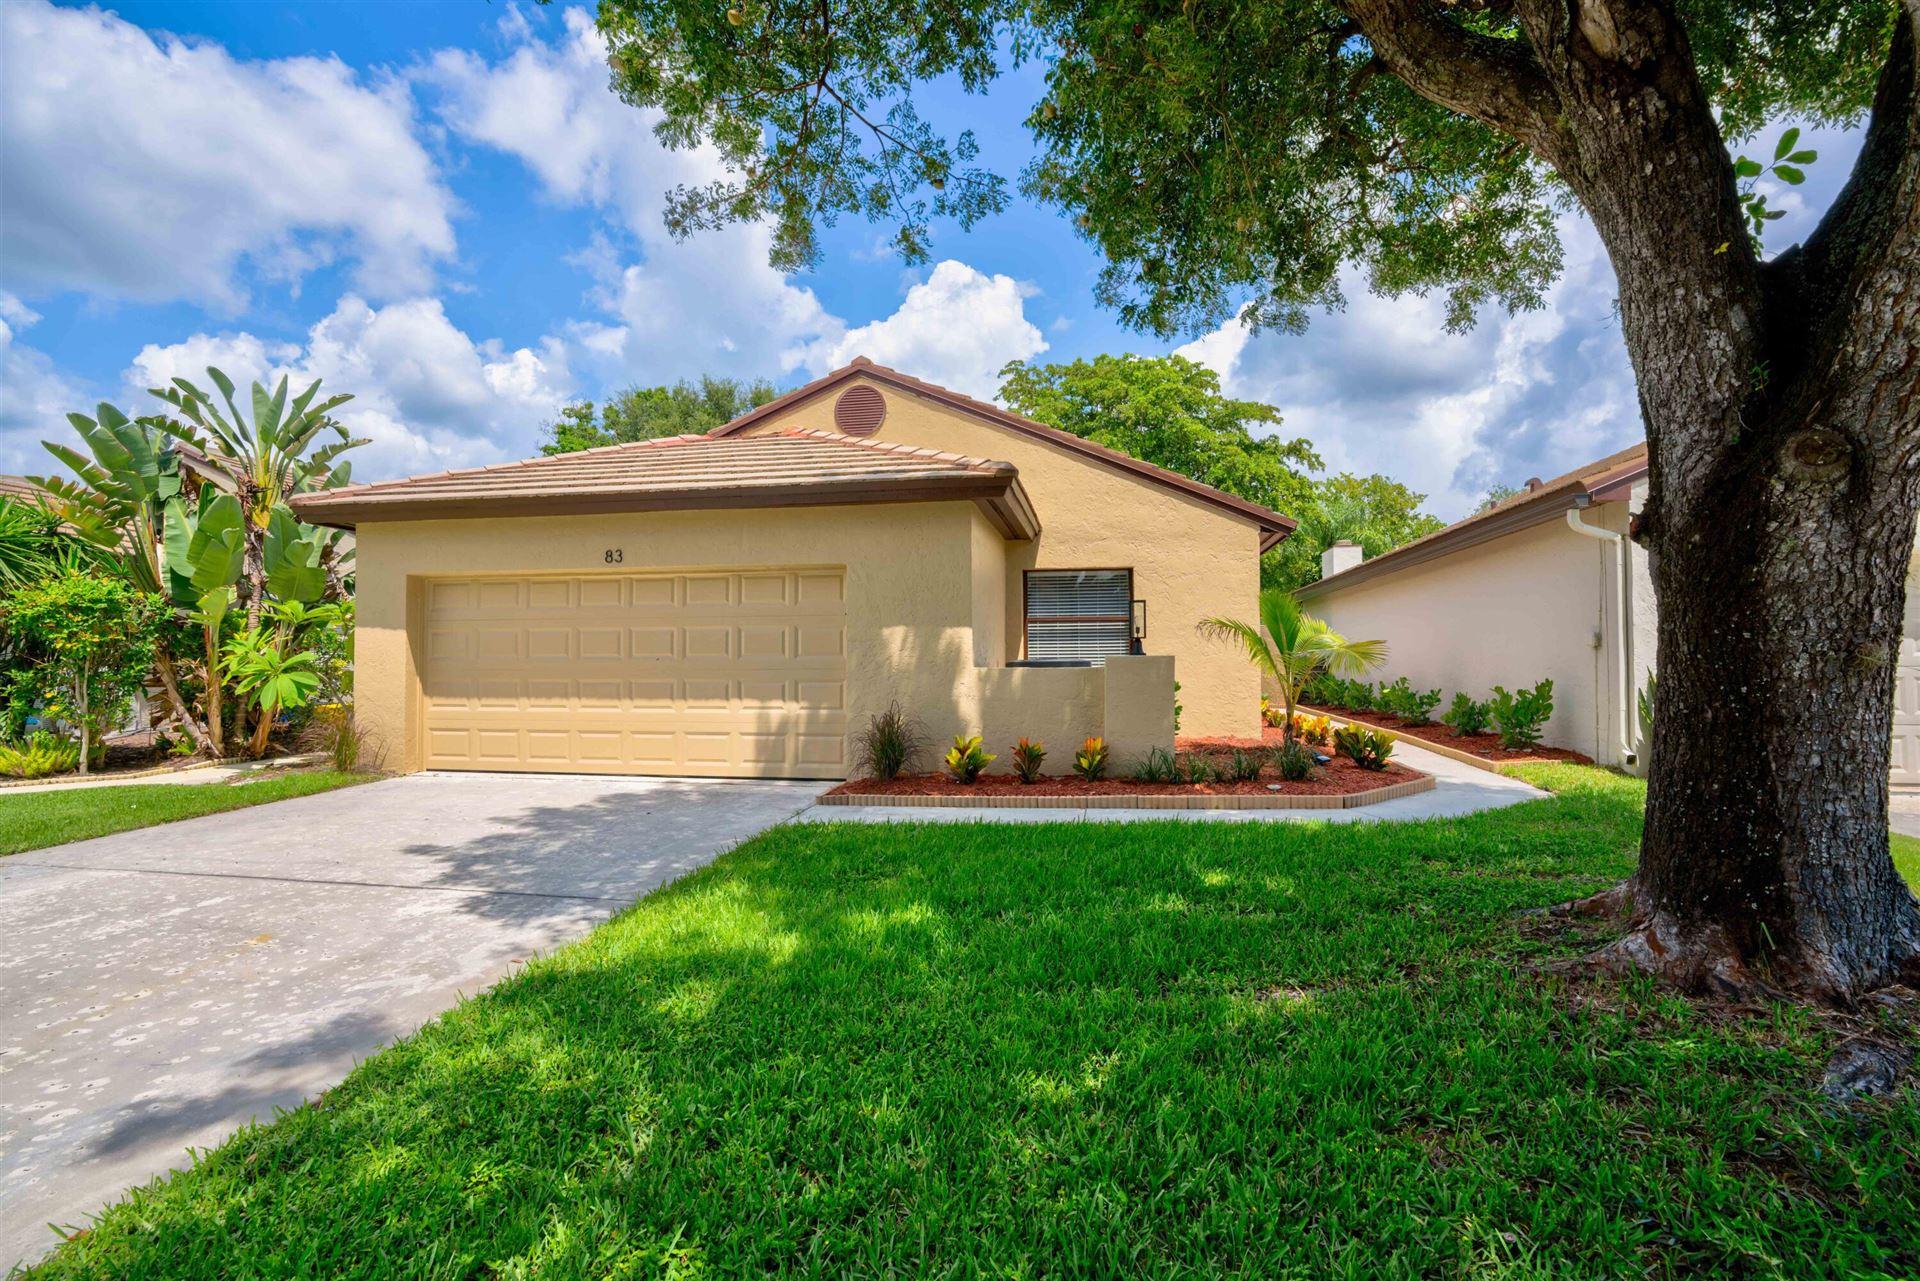 Photo of 83 Ironwood Way N, Palm Beach Gardens, FL 33418 (MLS # RX-10744412)